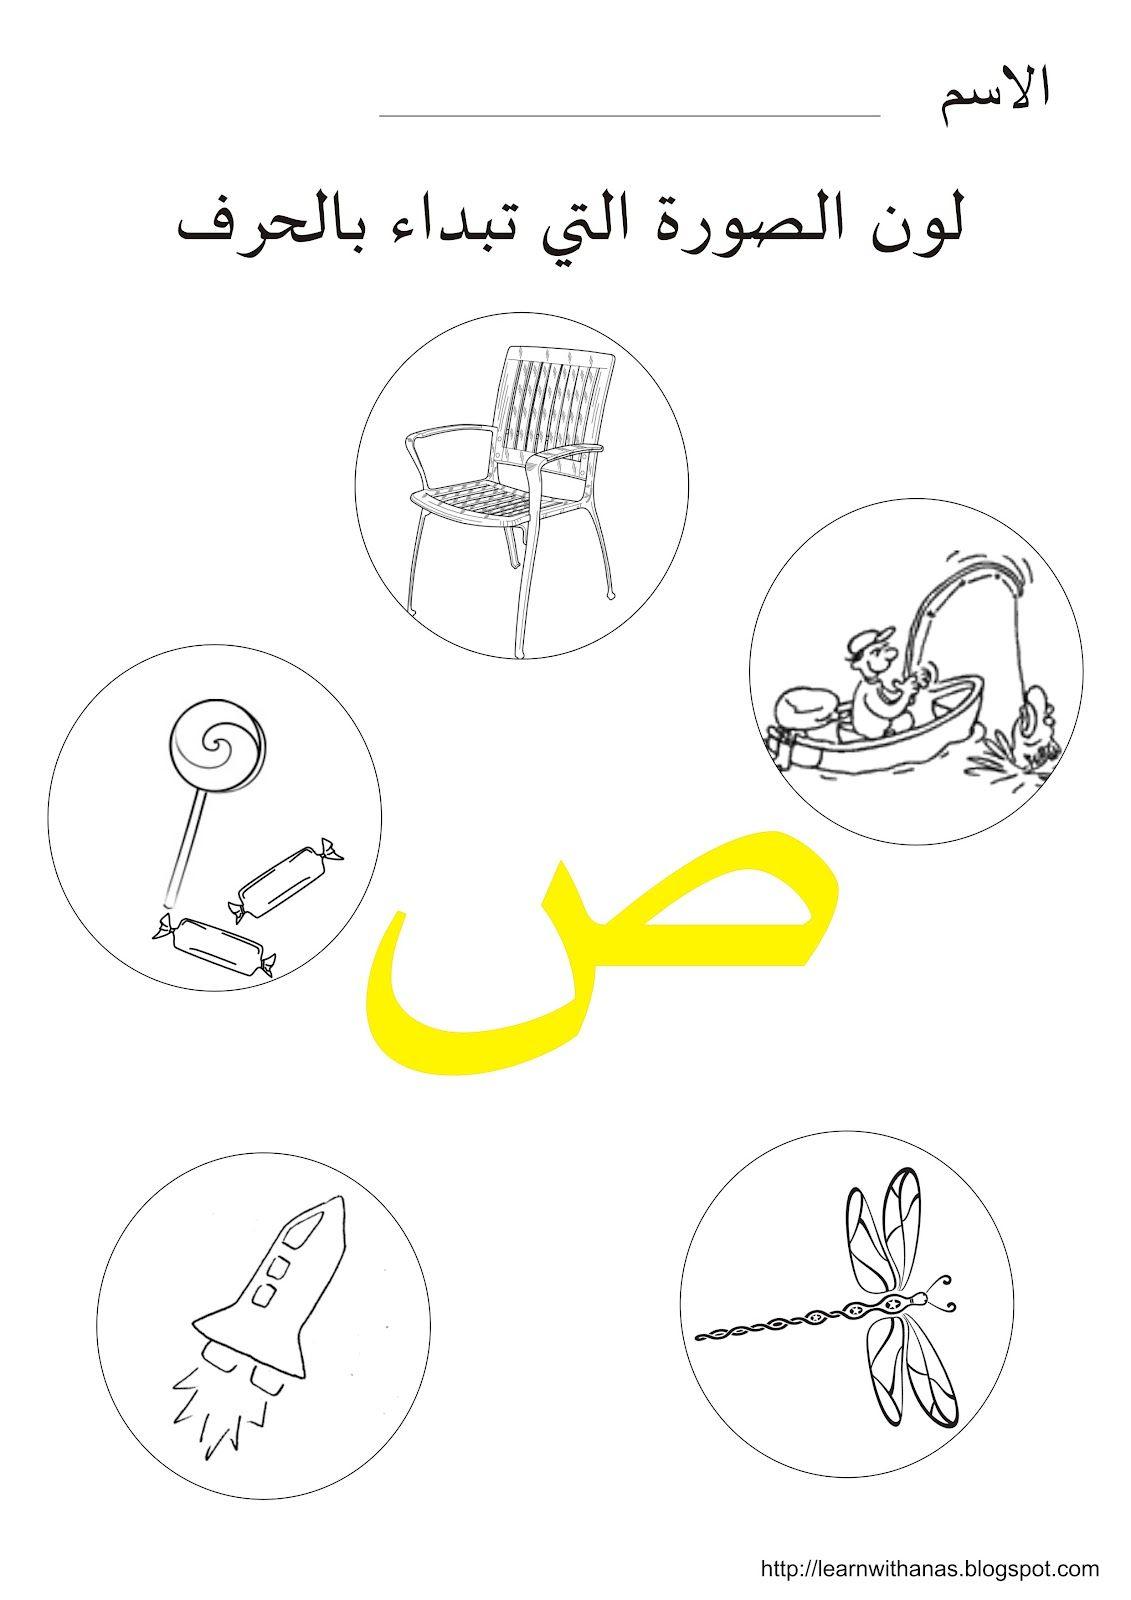 Color The Picture Starts With Saad Jpg 1 131 1 600 Pixels Arabic Alphabet Letters Arabic Alphabet Learn Arabic Alphabet